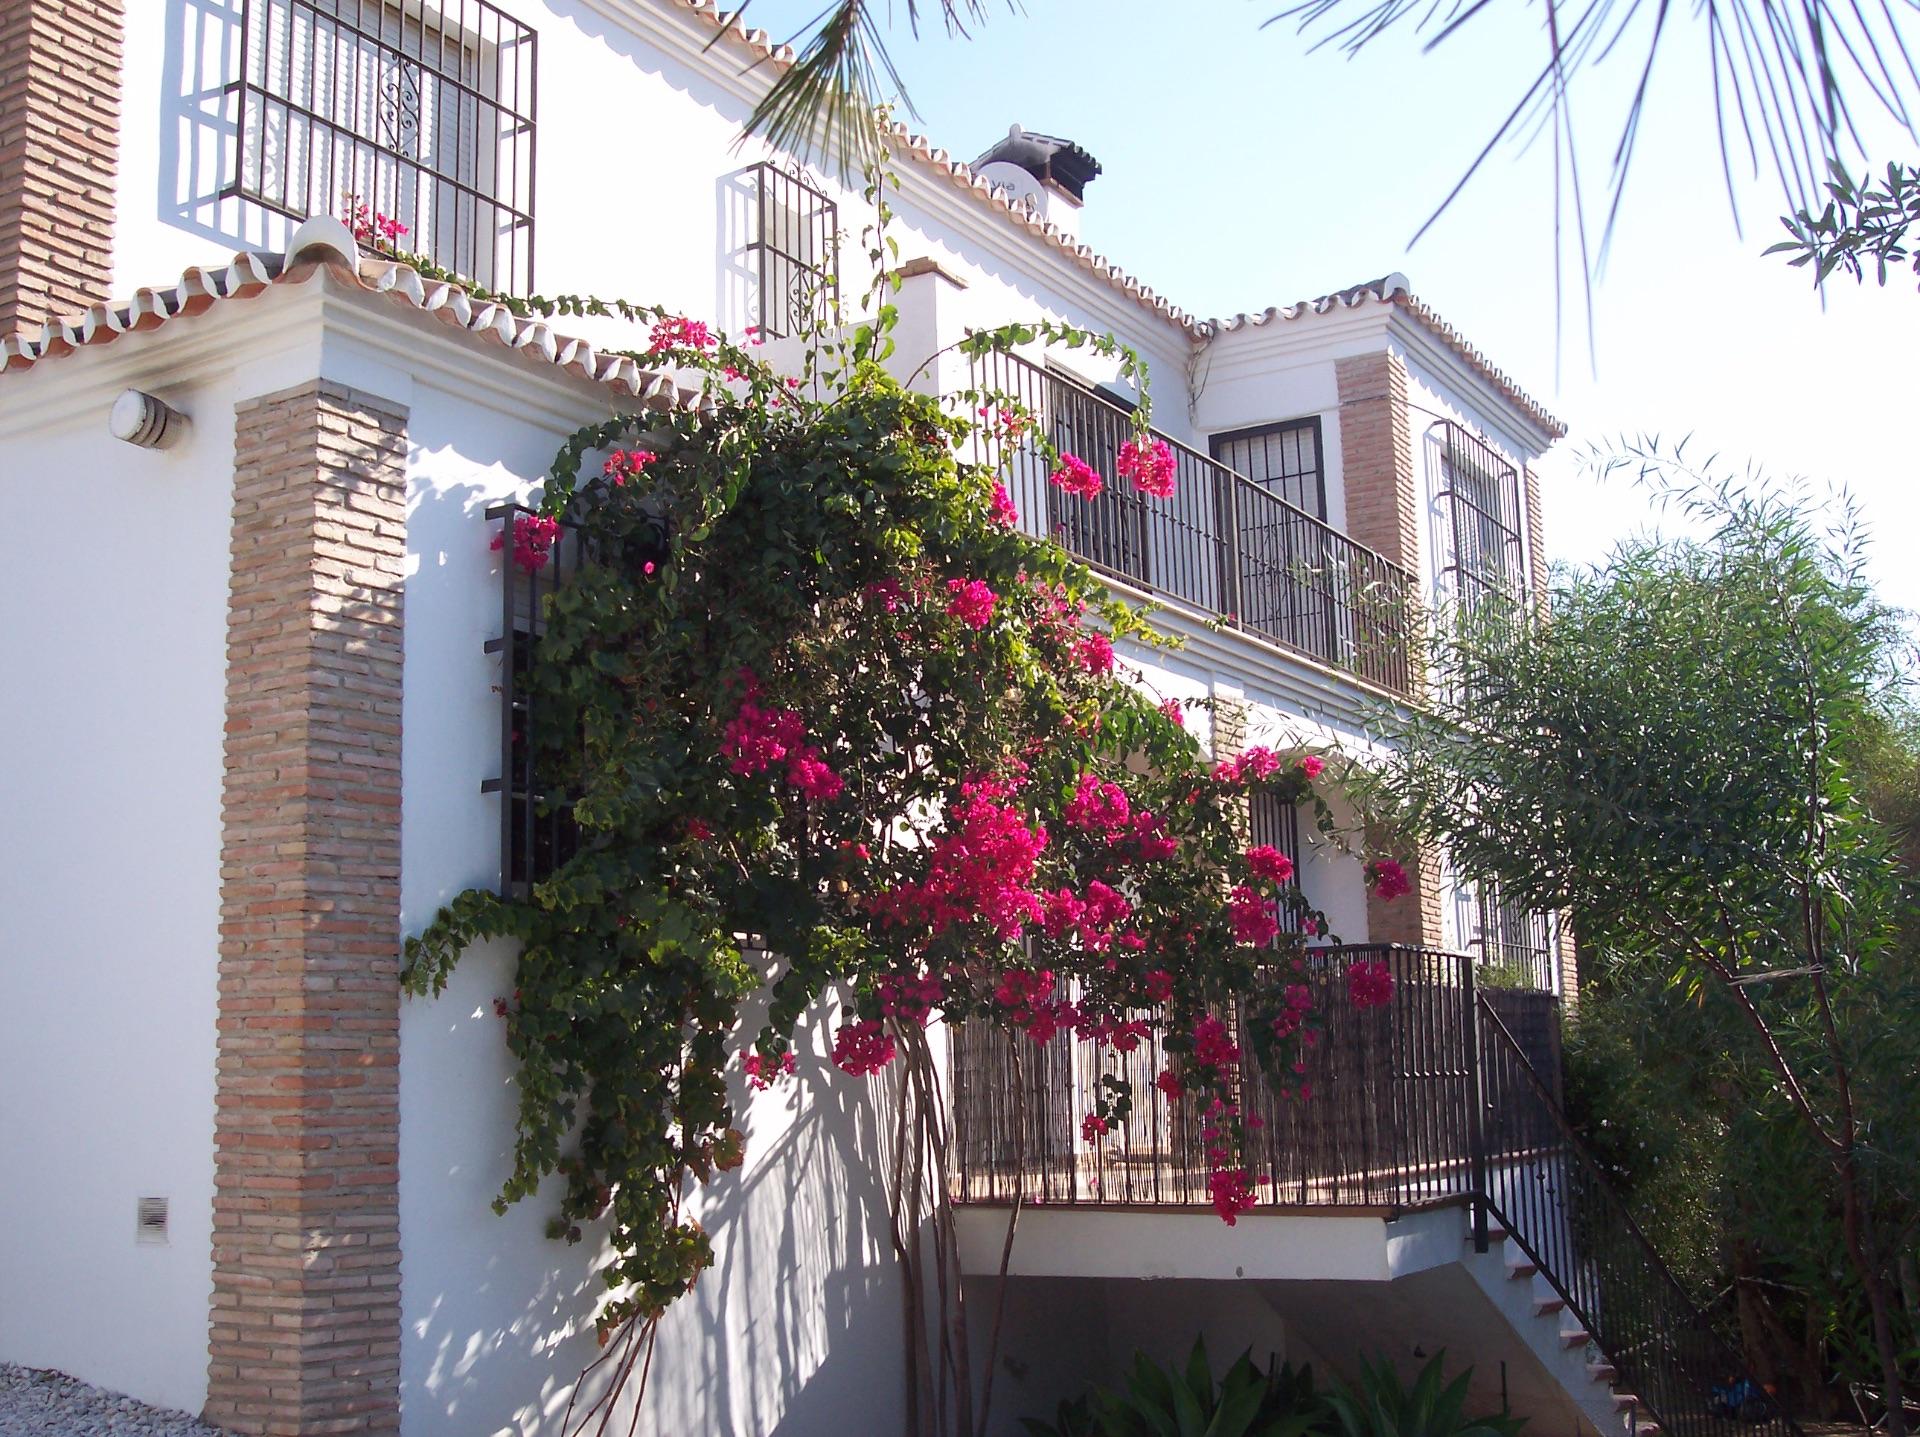 Casa / Chalet en Mijas, Campo Mijas, venta